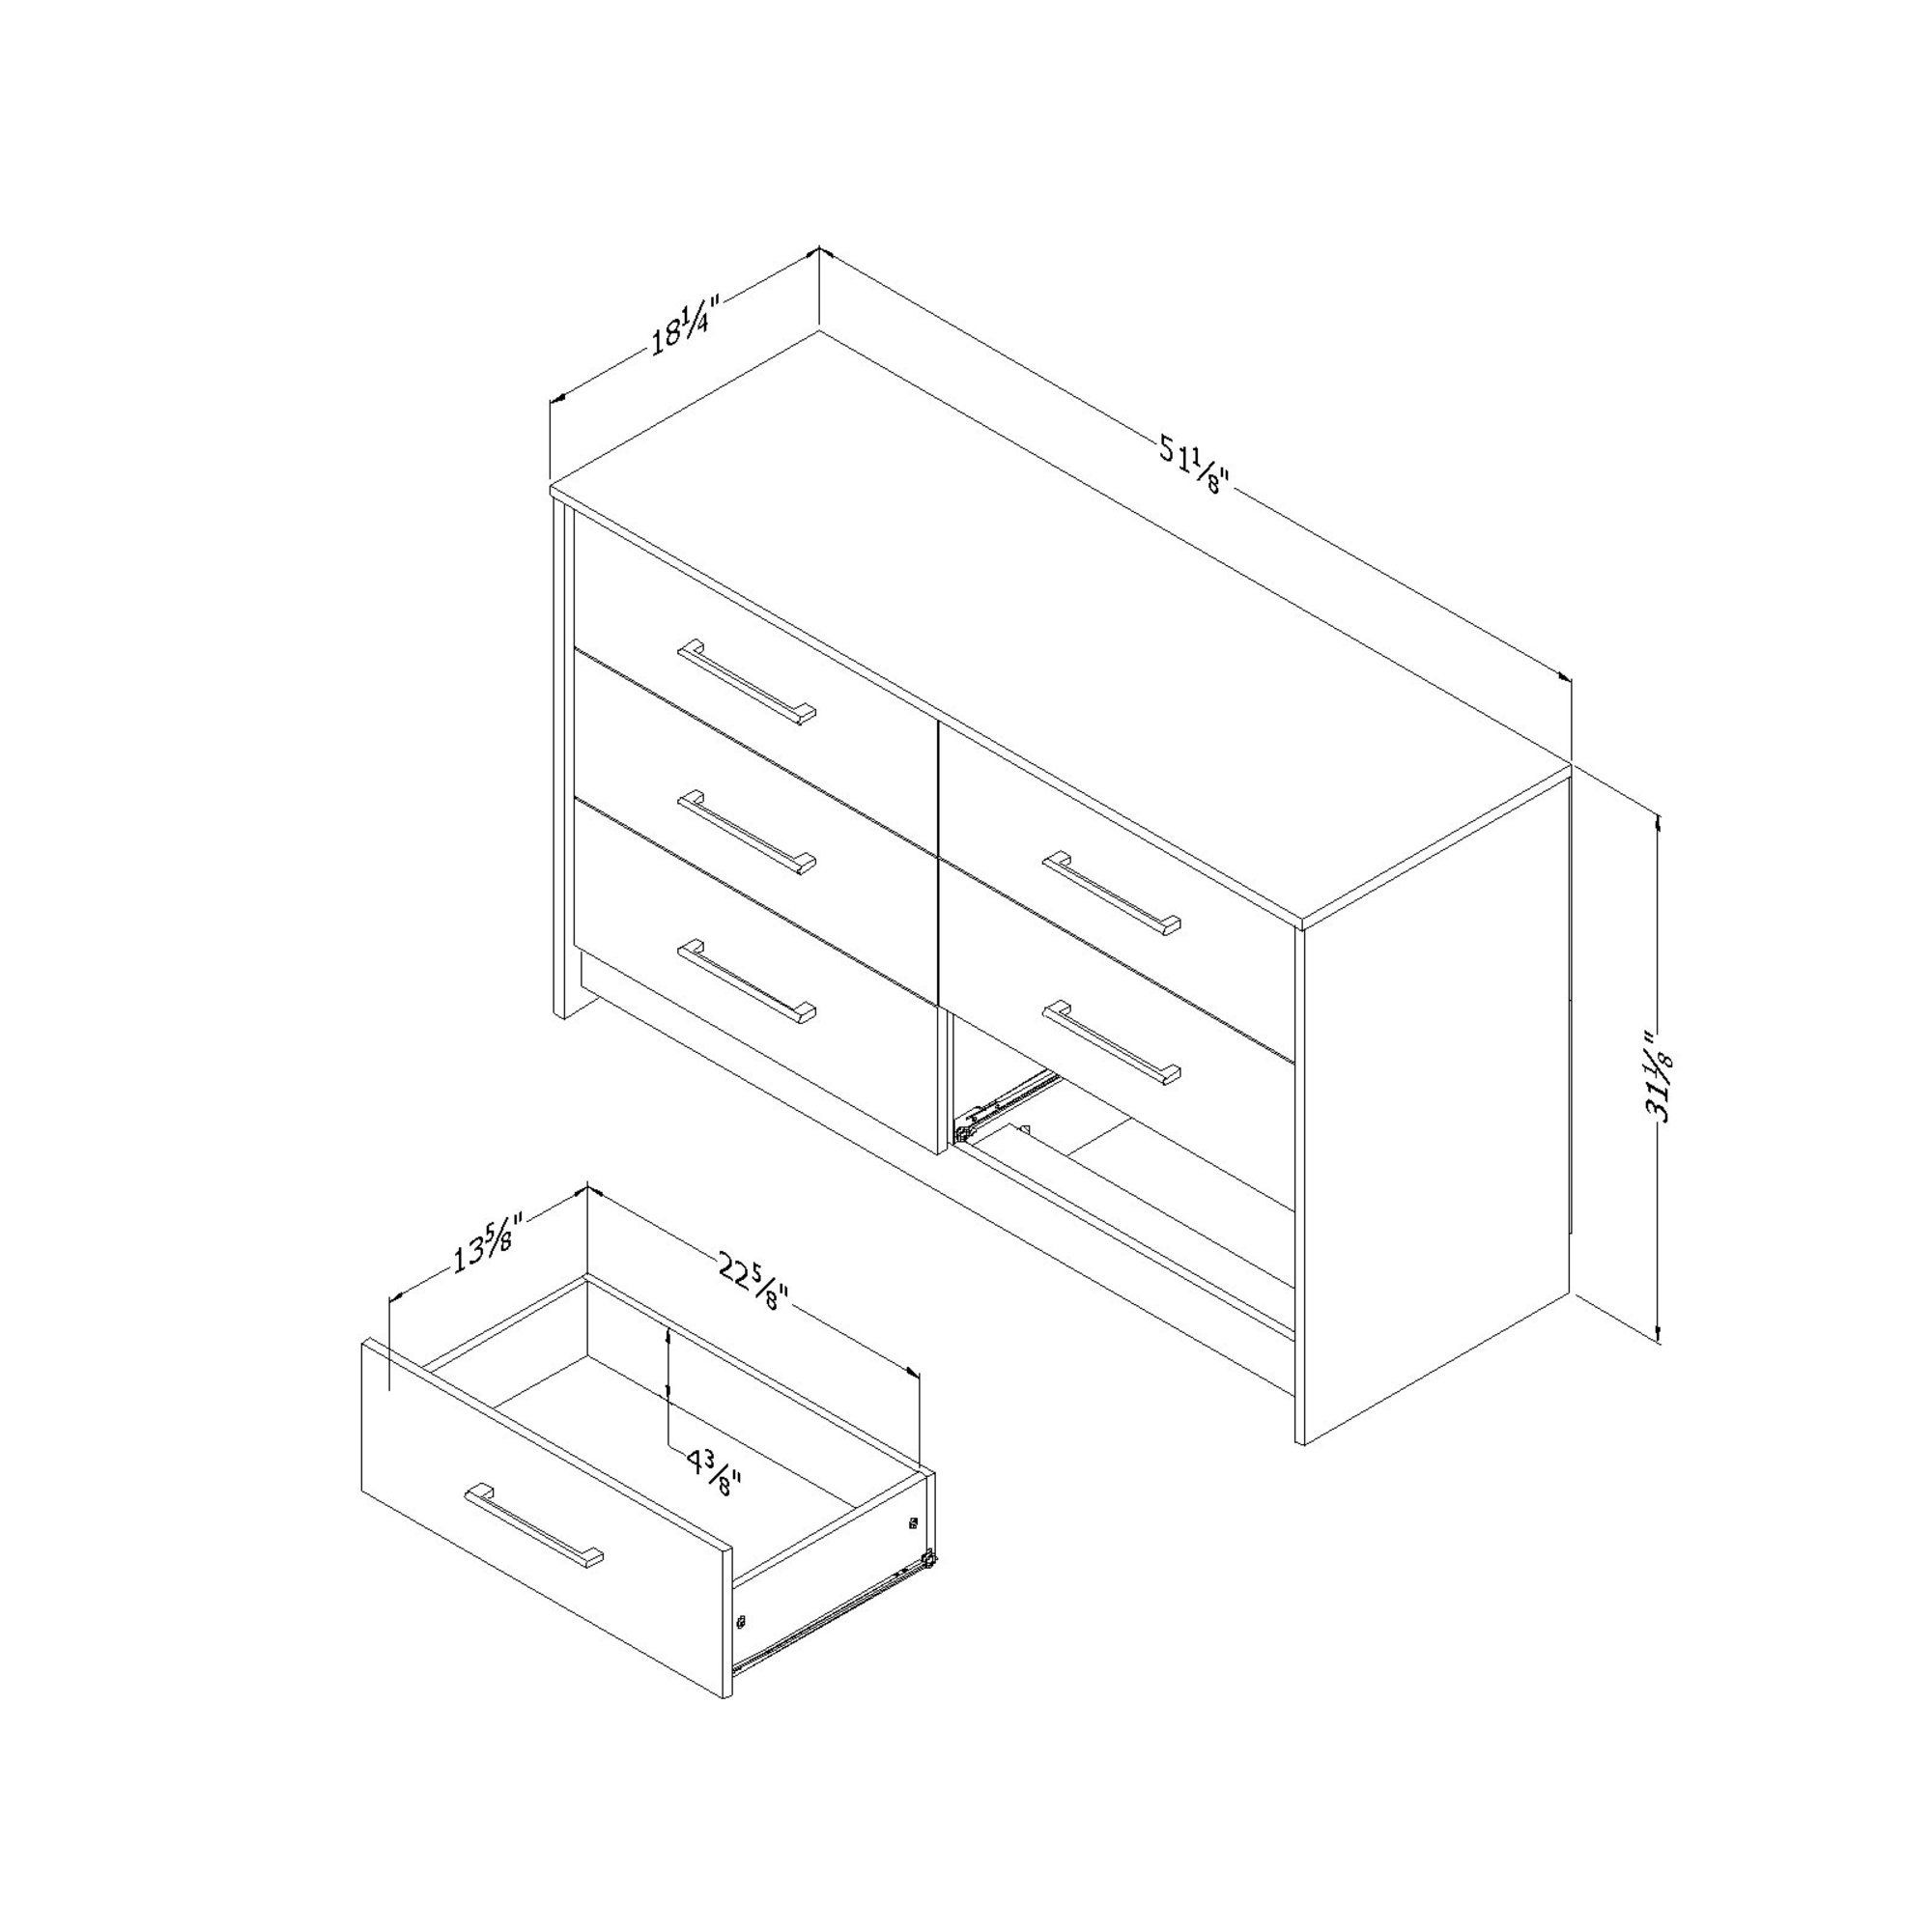 South Shore Londen 6 Drawer Double Dresser Weathered Oak And Ebony Walmart Com Weathered Oak Double Dresser Dresser Drawers [ 2000 x 2000 Pixel ]